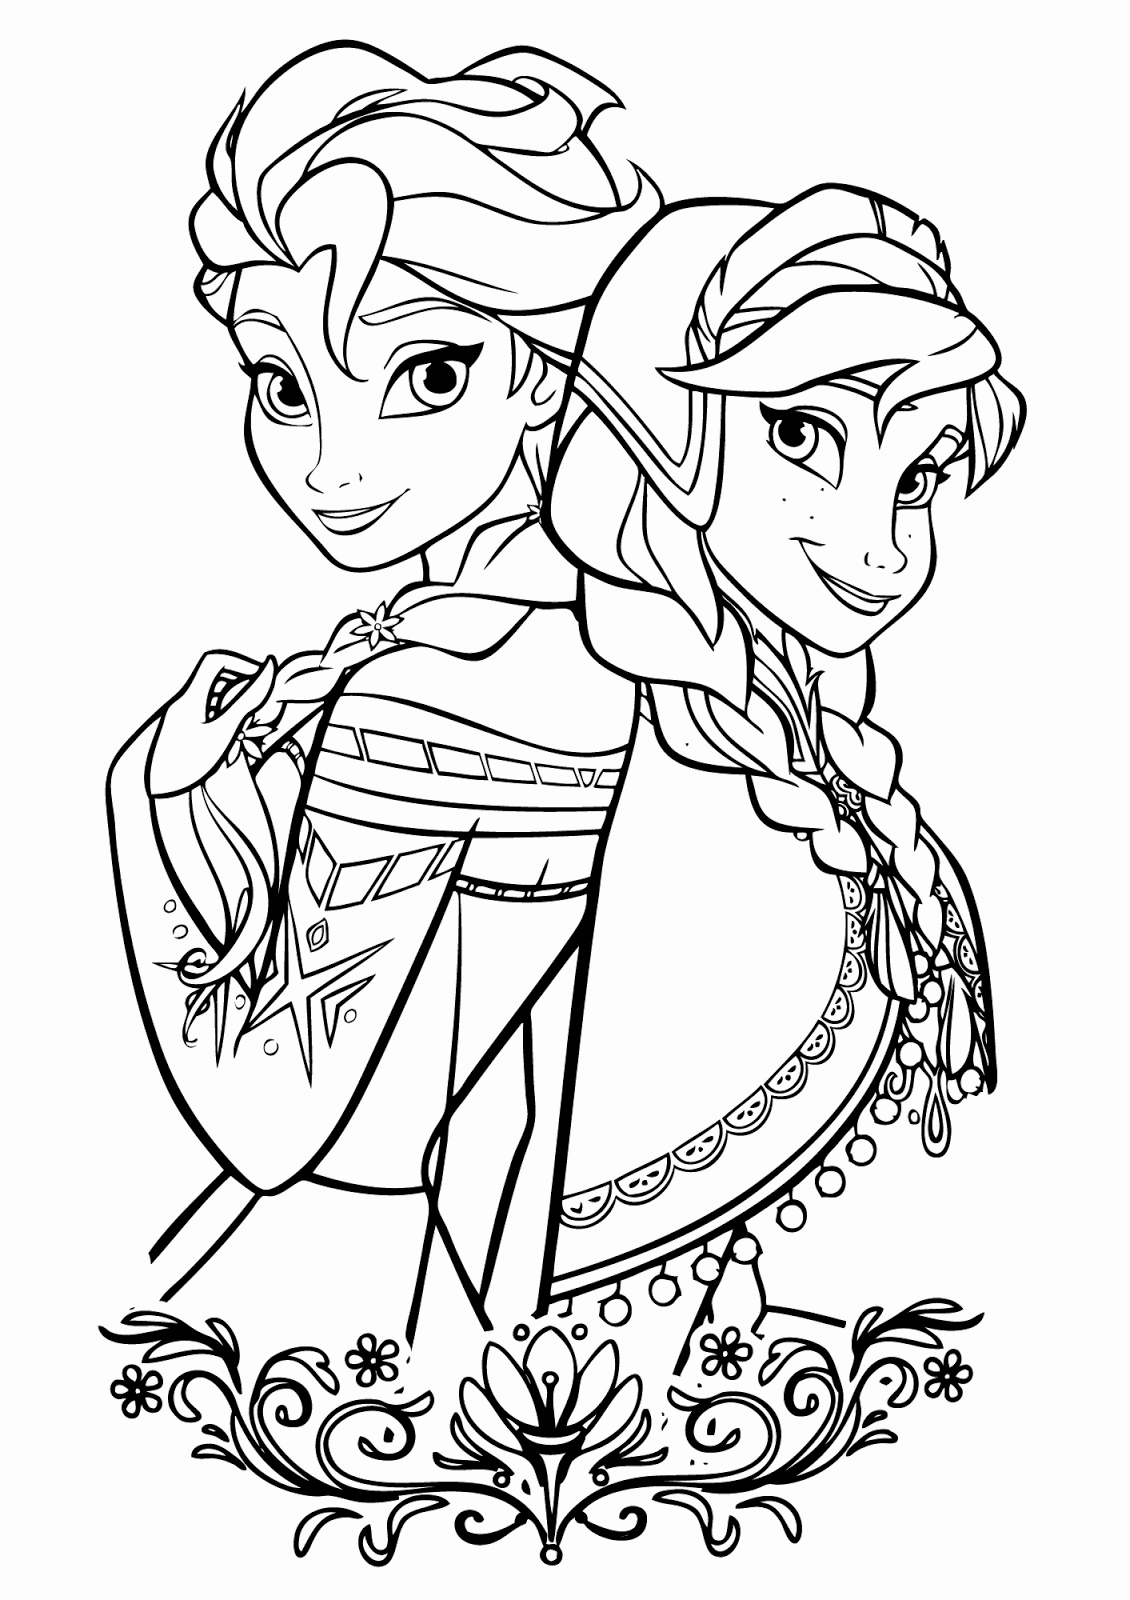 1130x1600 Disney Princess Free Coloring Pages Princess Coloring Pages Disney